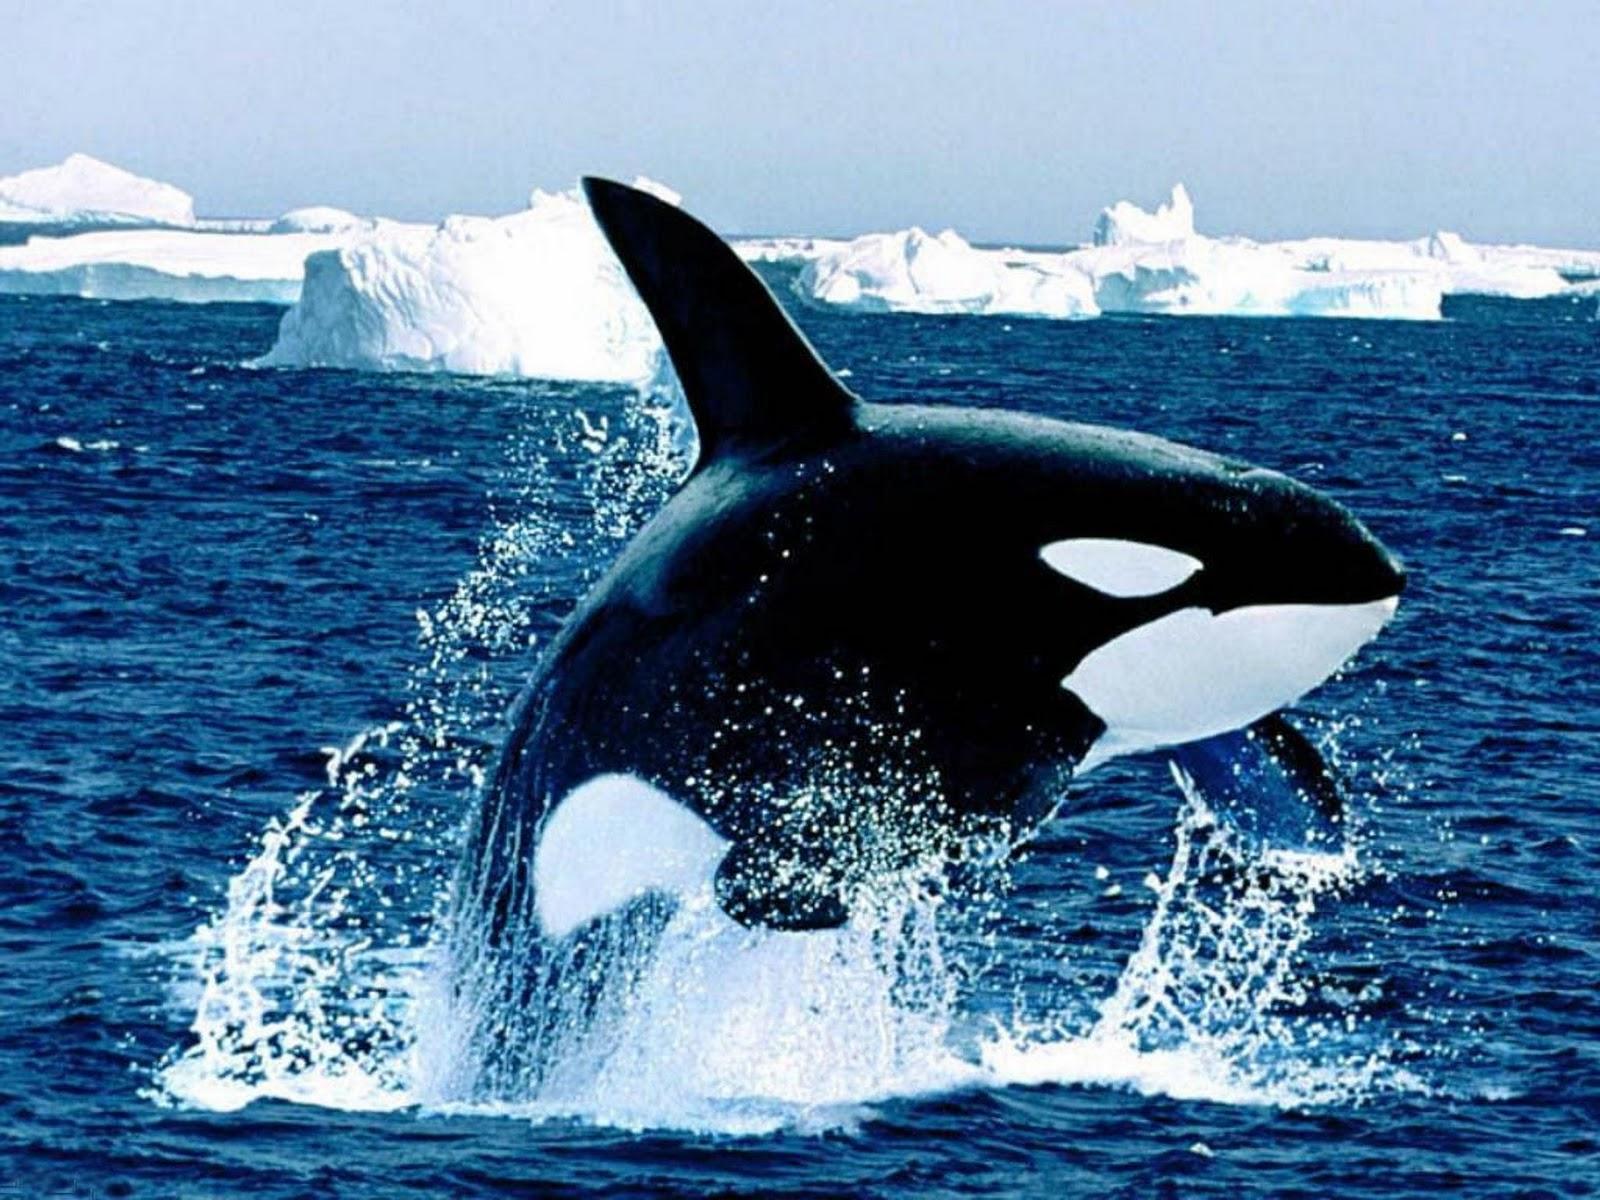 Killer Whales 9134 1600x1200 px